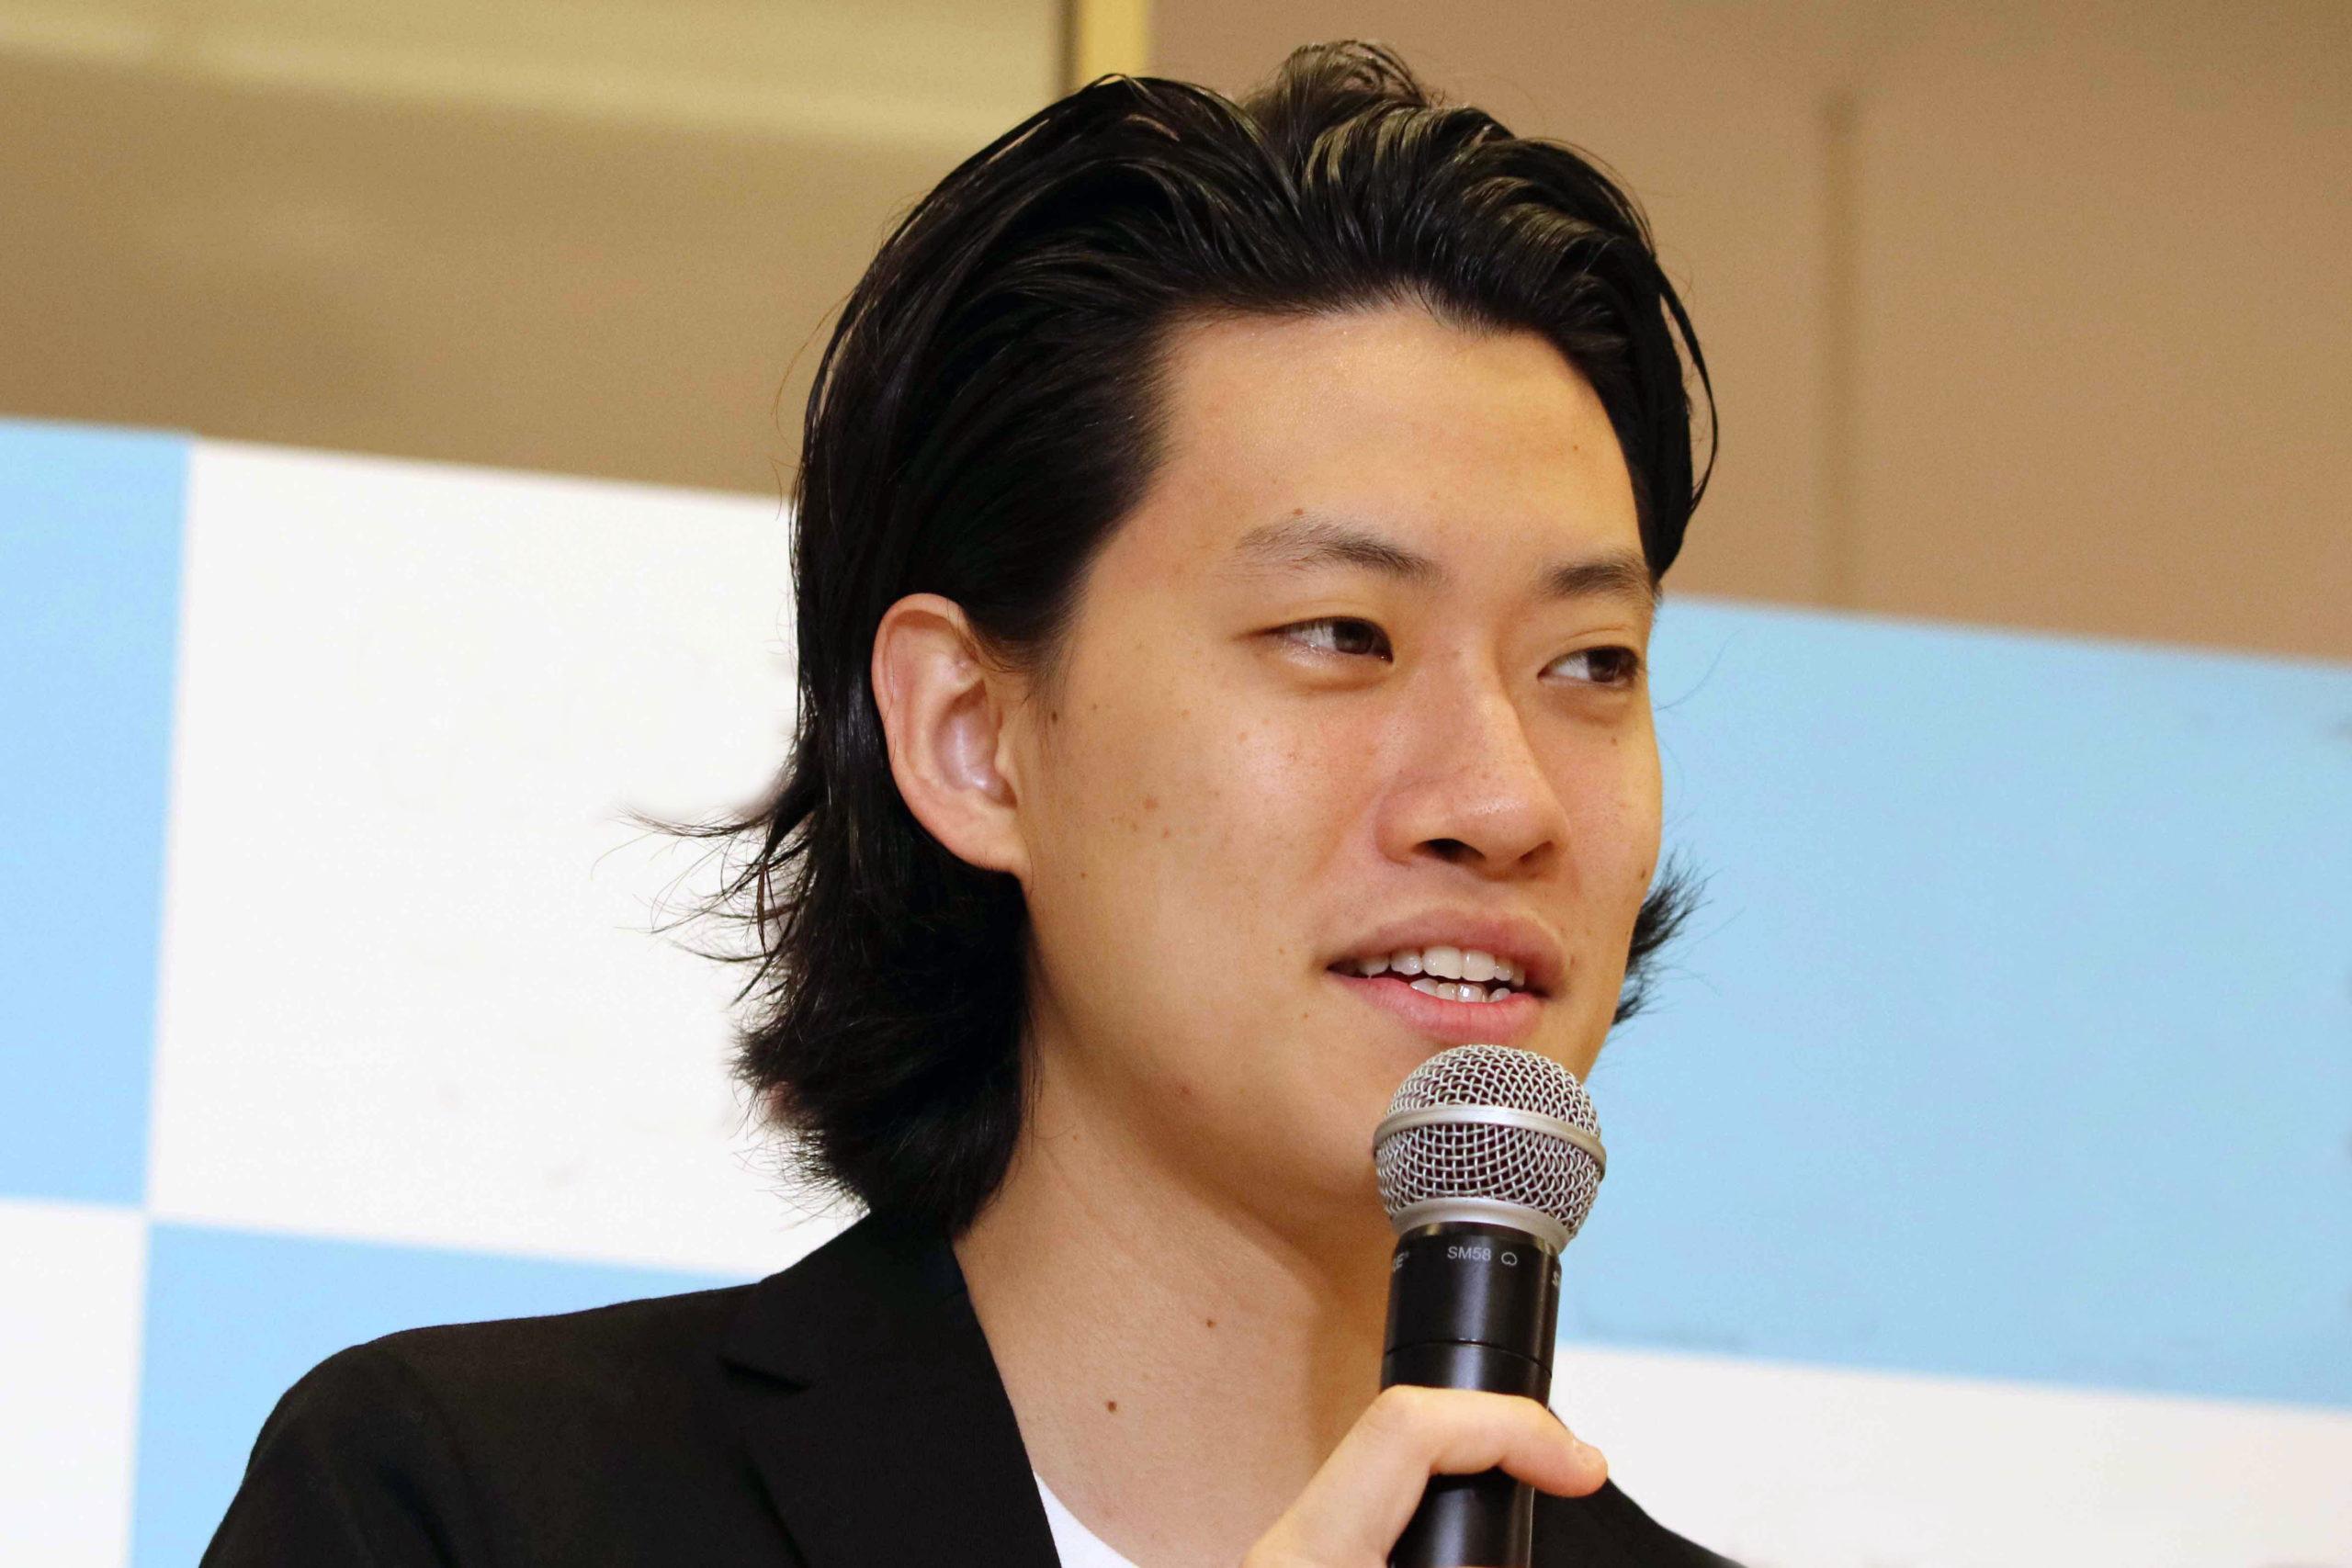 https://ranshuu.net/wp-content/uploads/2020/12/kyouteitanoshimikata-top-scaled.jpg